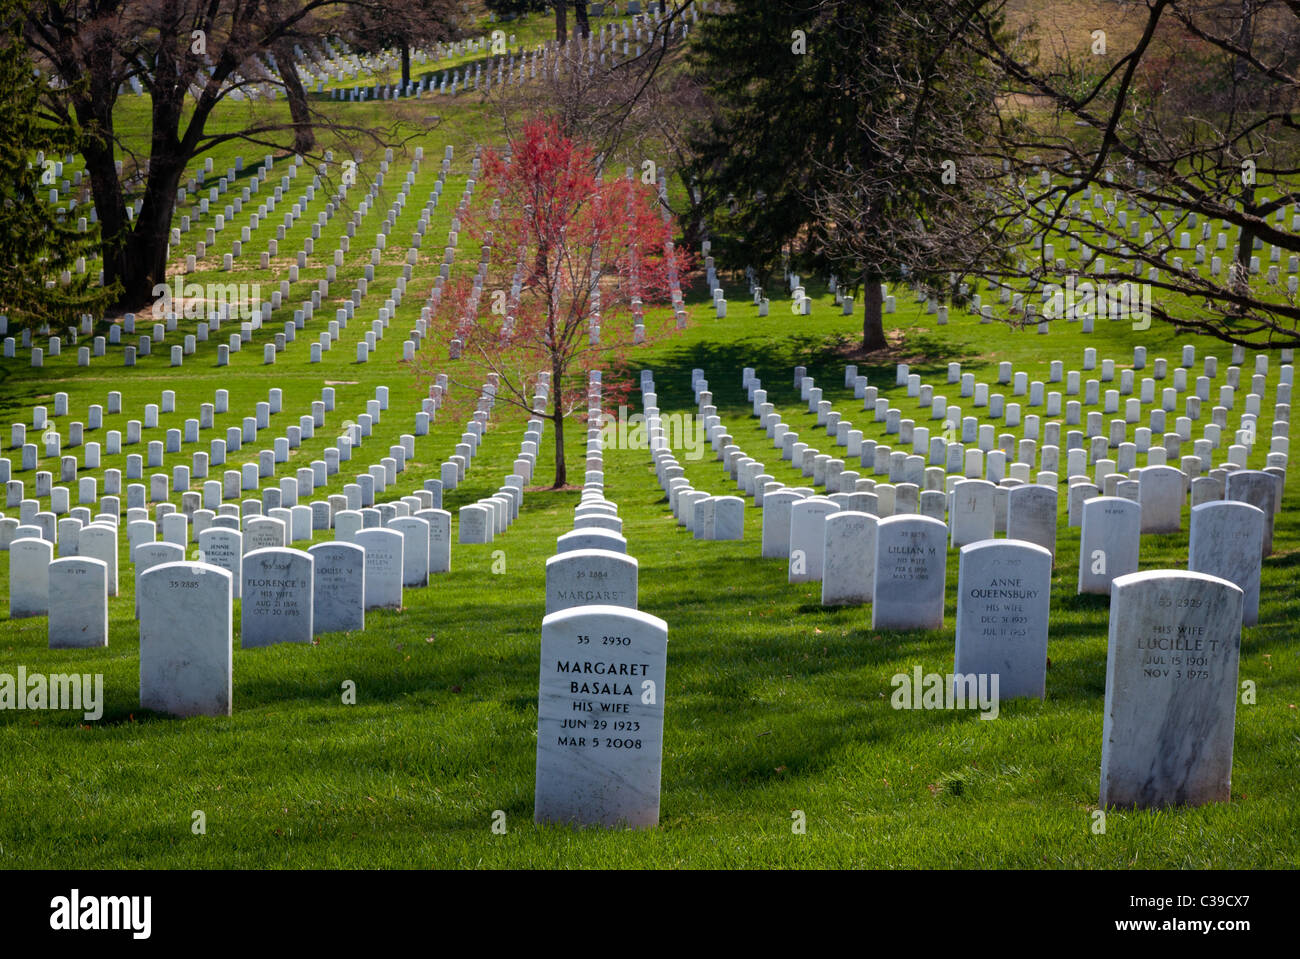 Arlington National Cemetery in Arlington, Virginia - Stock Image